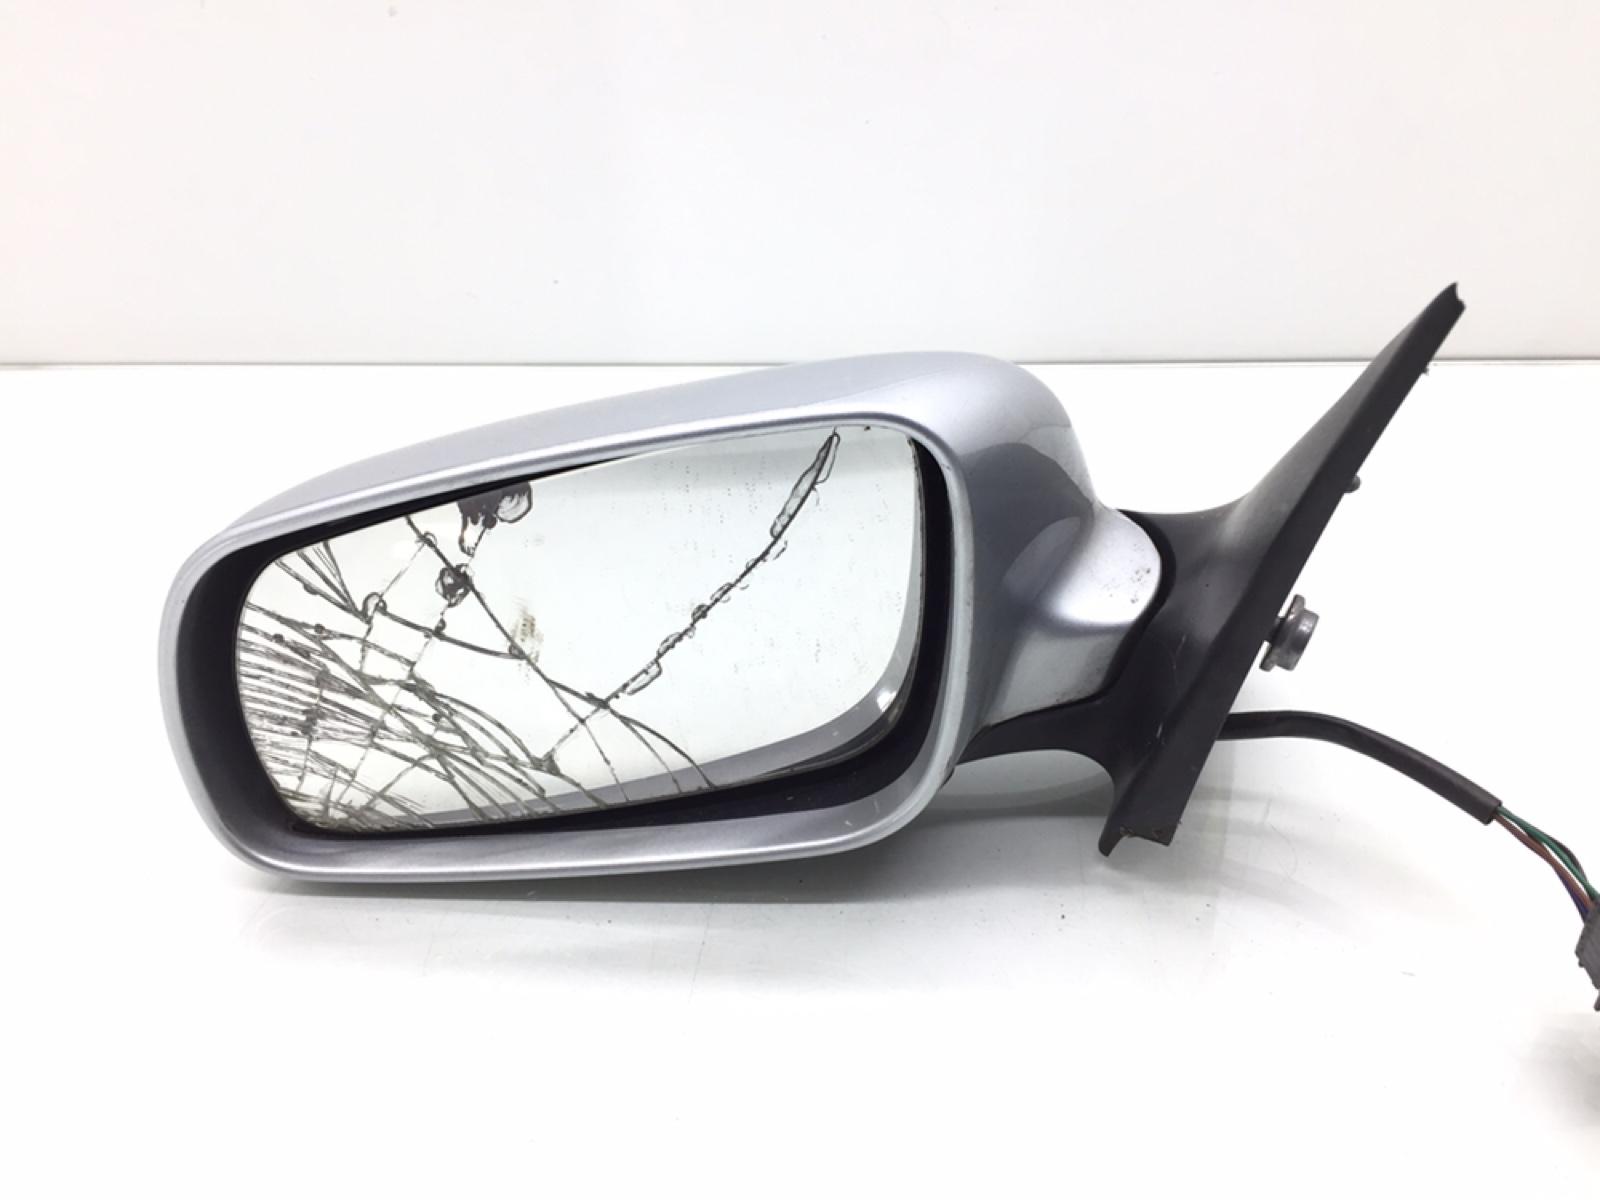 Зеркало наружное левое Skoda Fabia 1.9 TDI 2007 (б/у)